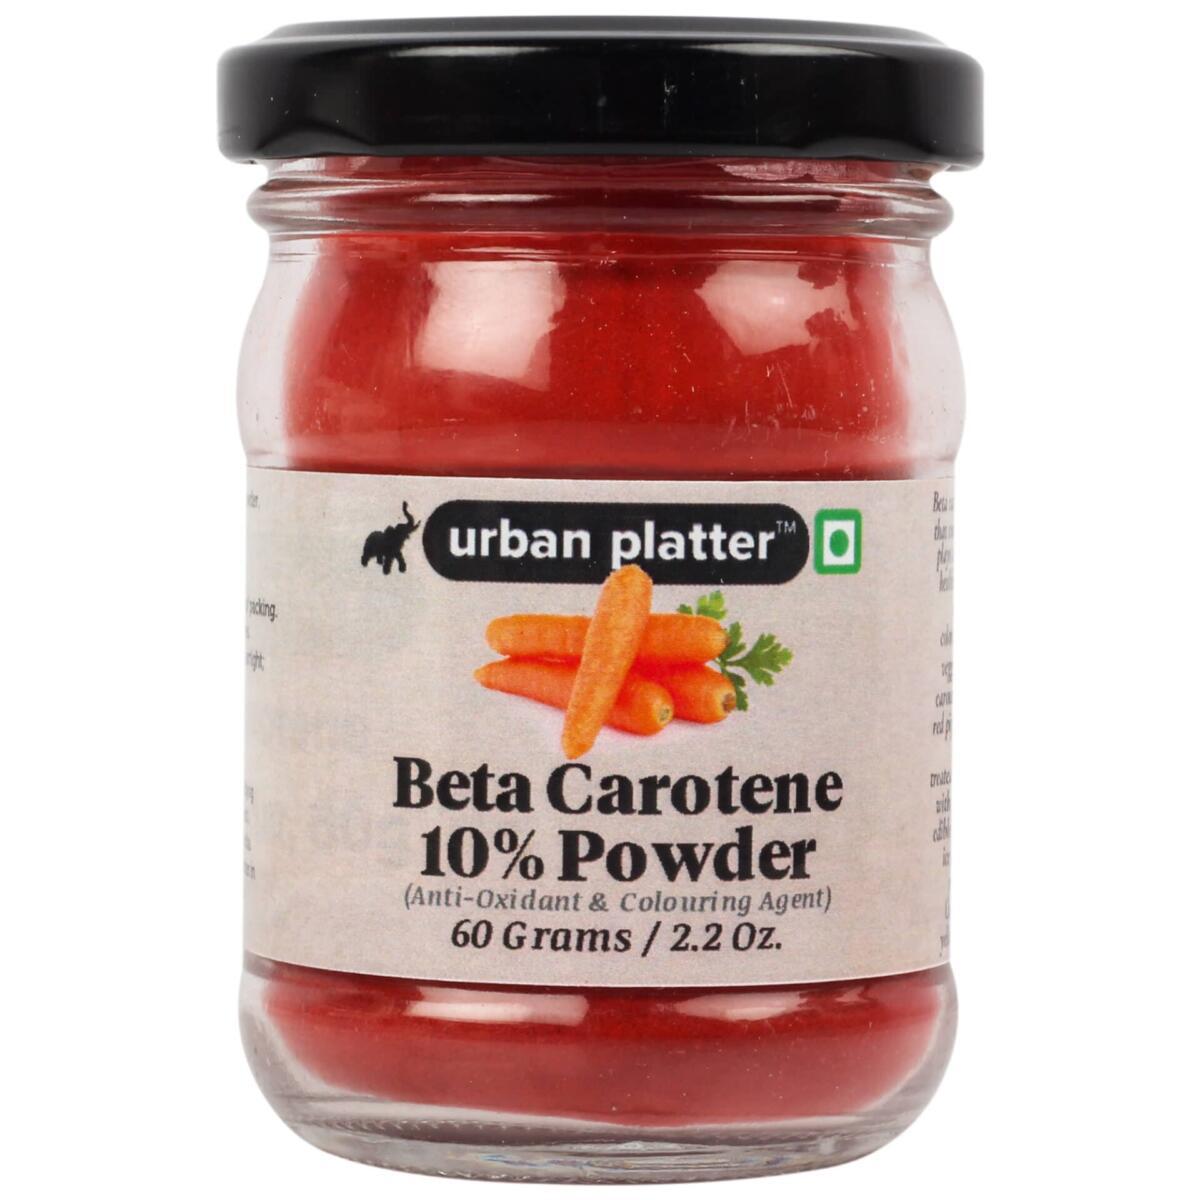 Urban Platter Beta Carotene 10% Powder, 60g / 2.2oz [Provitamin A, Antioxidant & Colouring Agent]